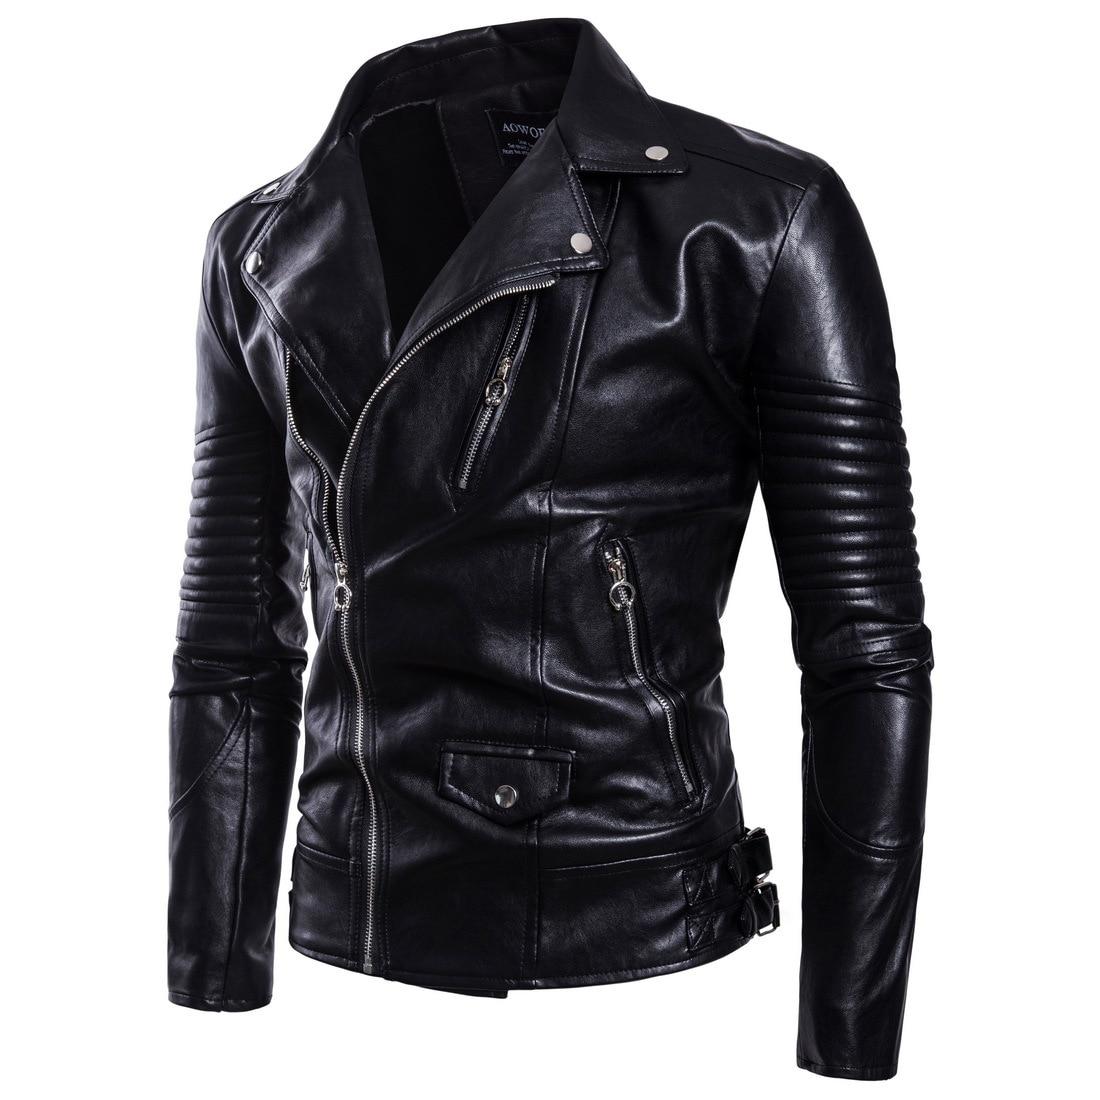 Fashion Ouma 2018 Autumn New Style Men Fold-down Collar Locomotive Leather Coat Men'S Wear Foreign Trade Leather Jacket B029